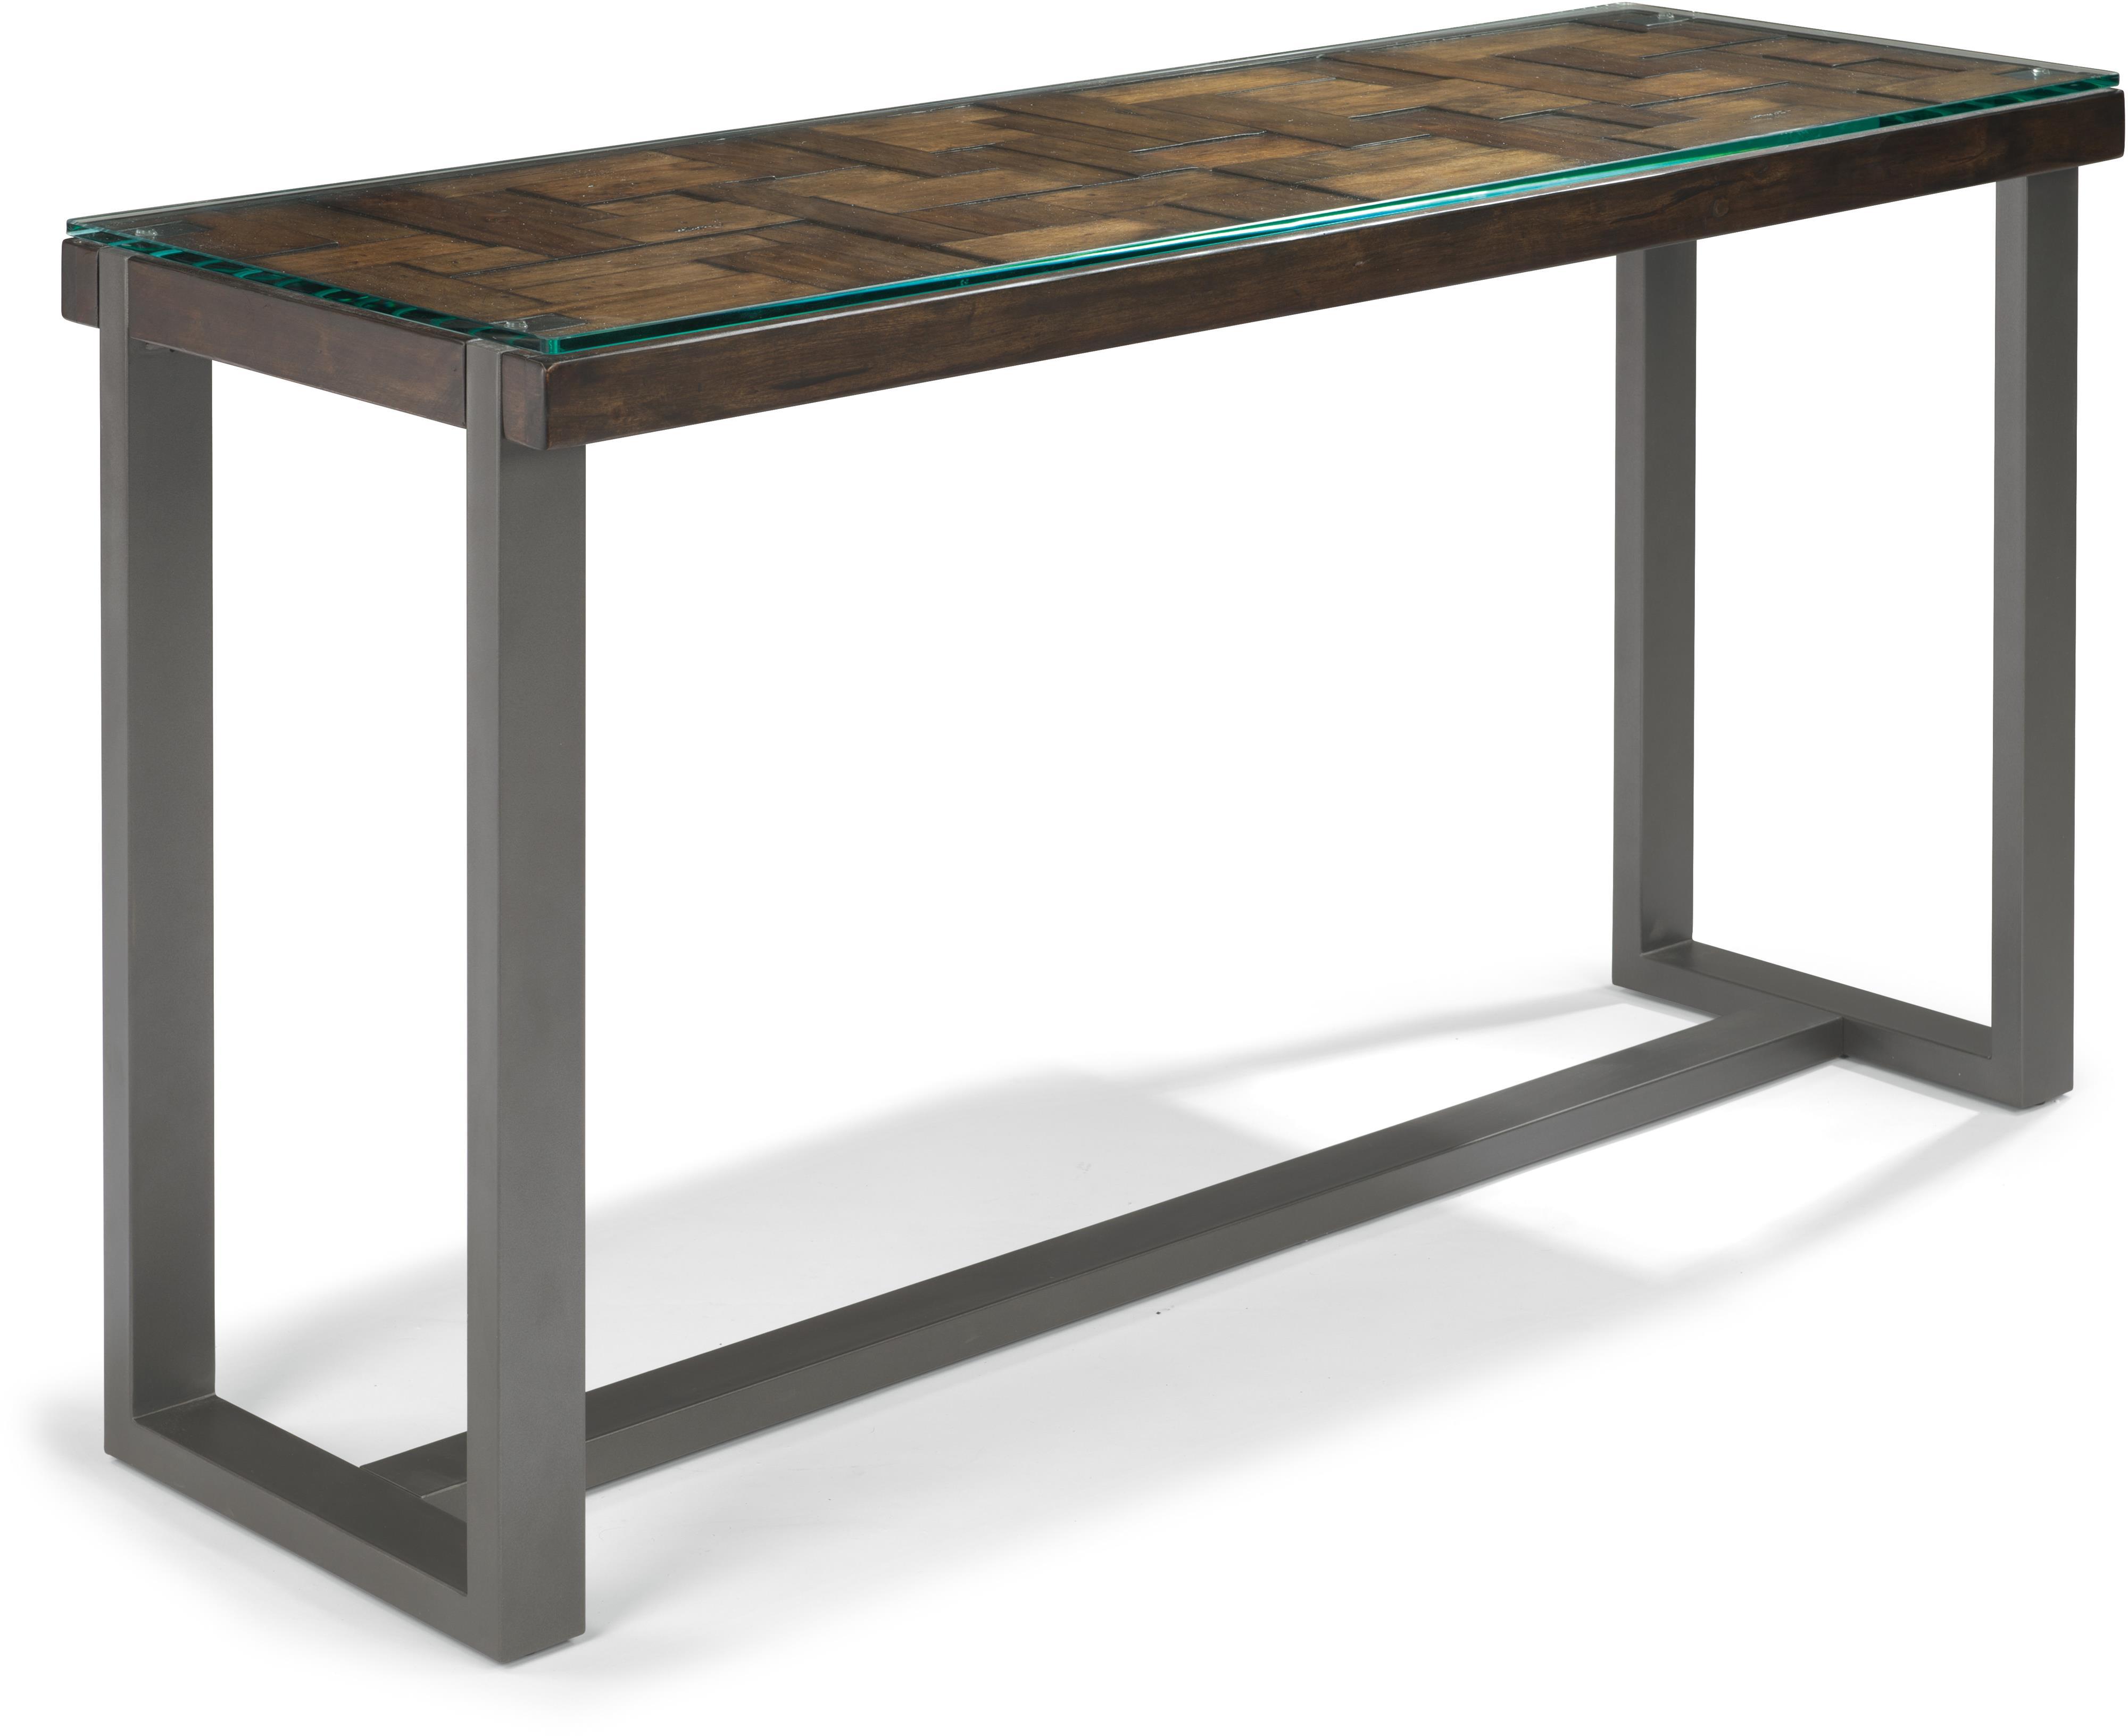 Flexsteel Patchwork Sofa Table  - Item Number: W1415-04